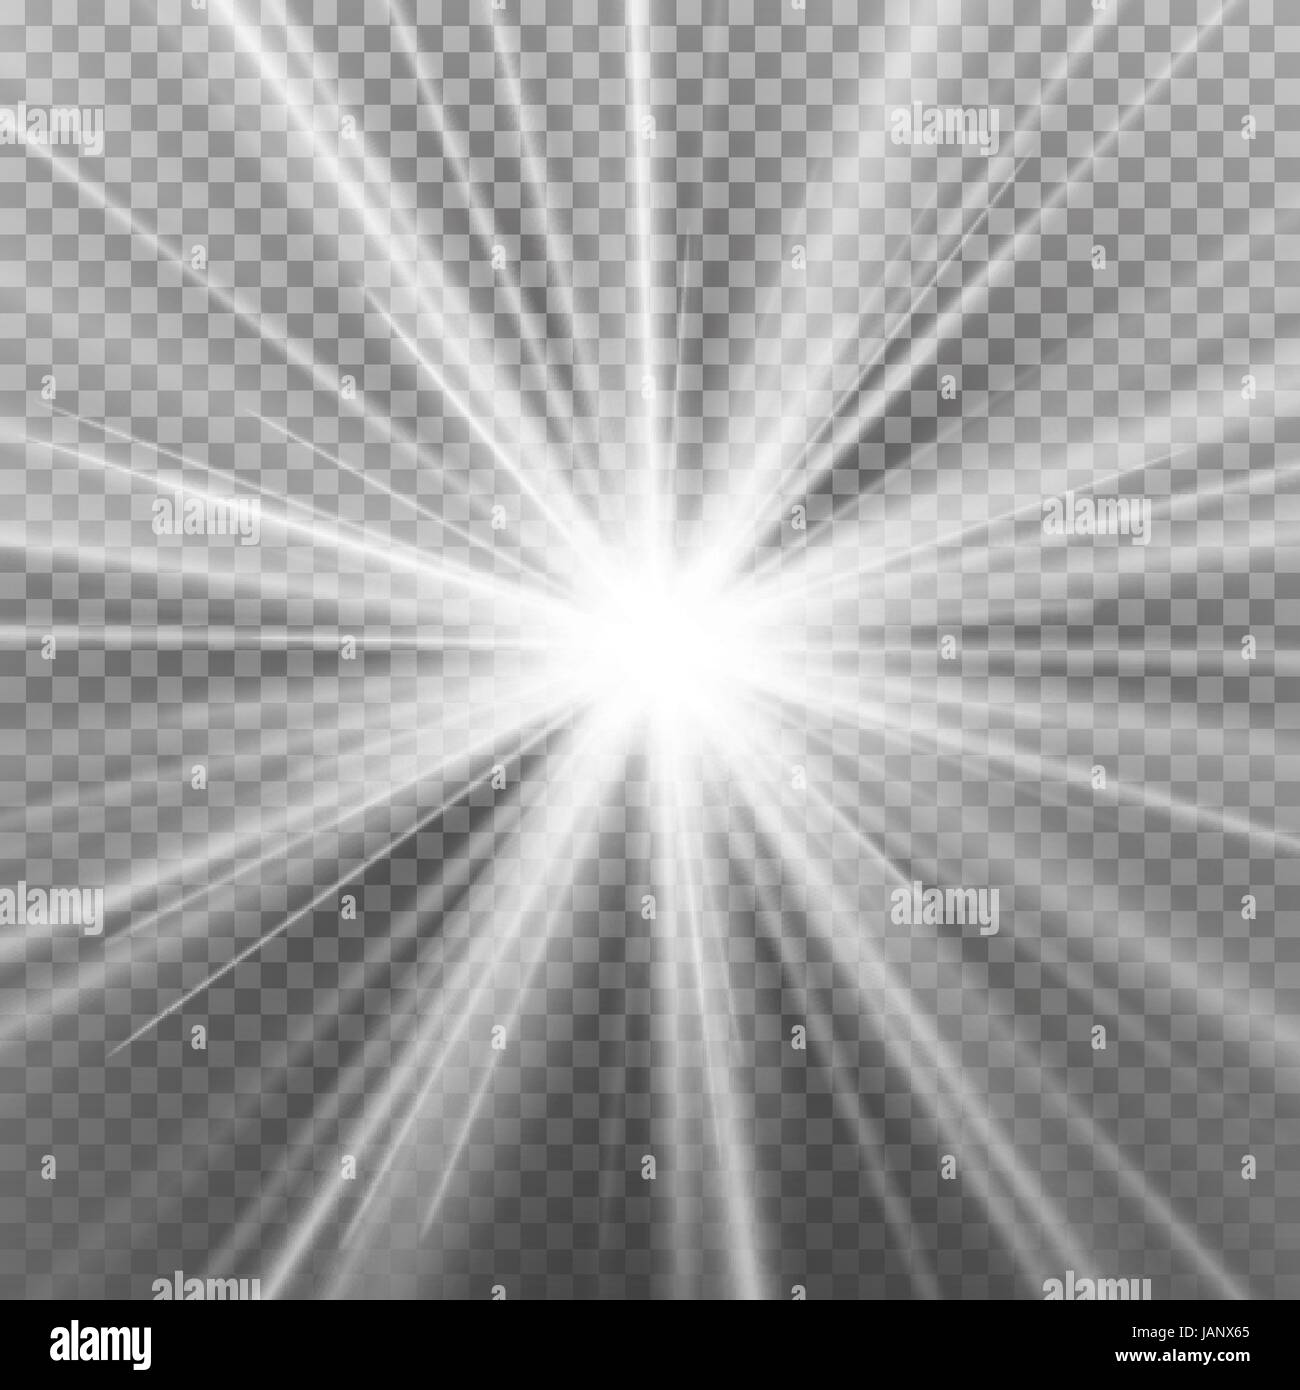 Transparent Light Rays